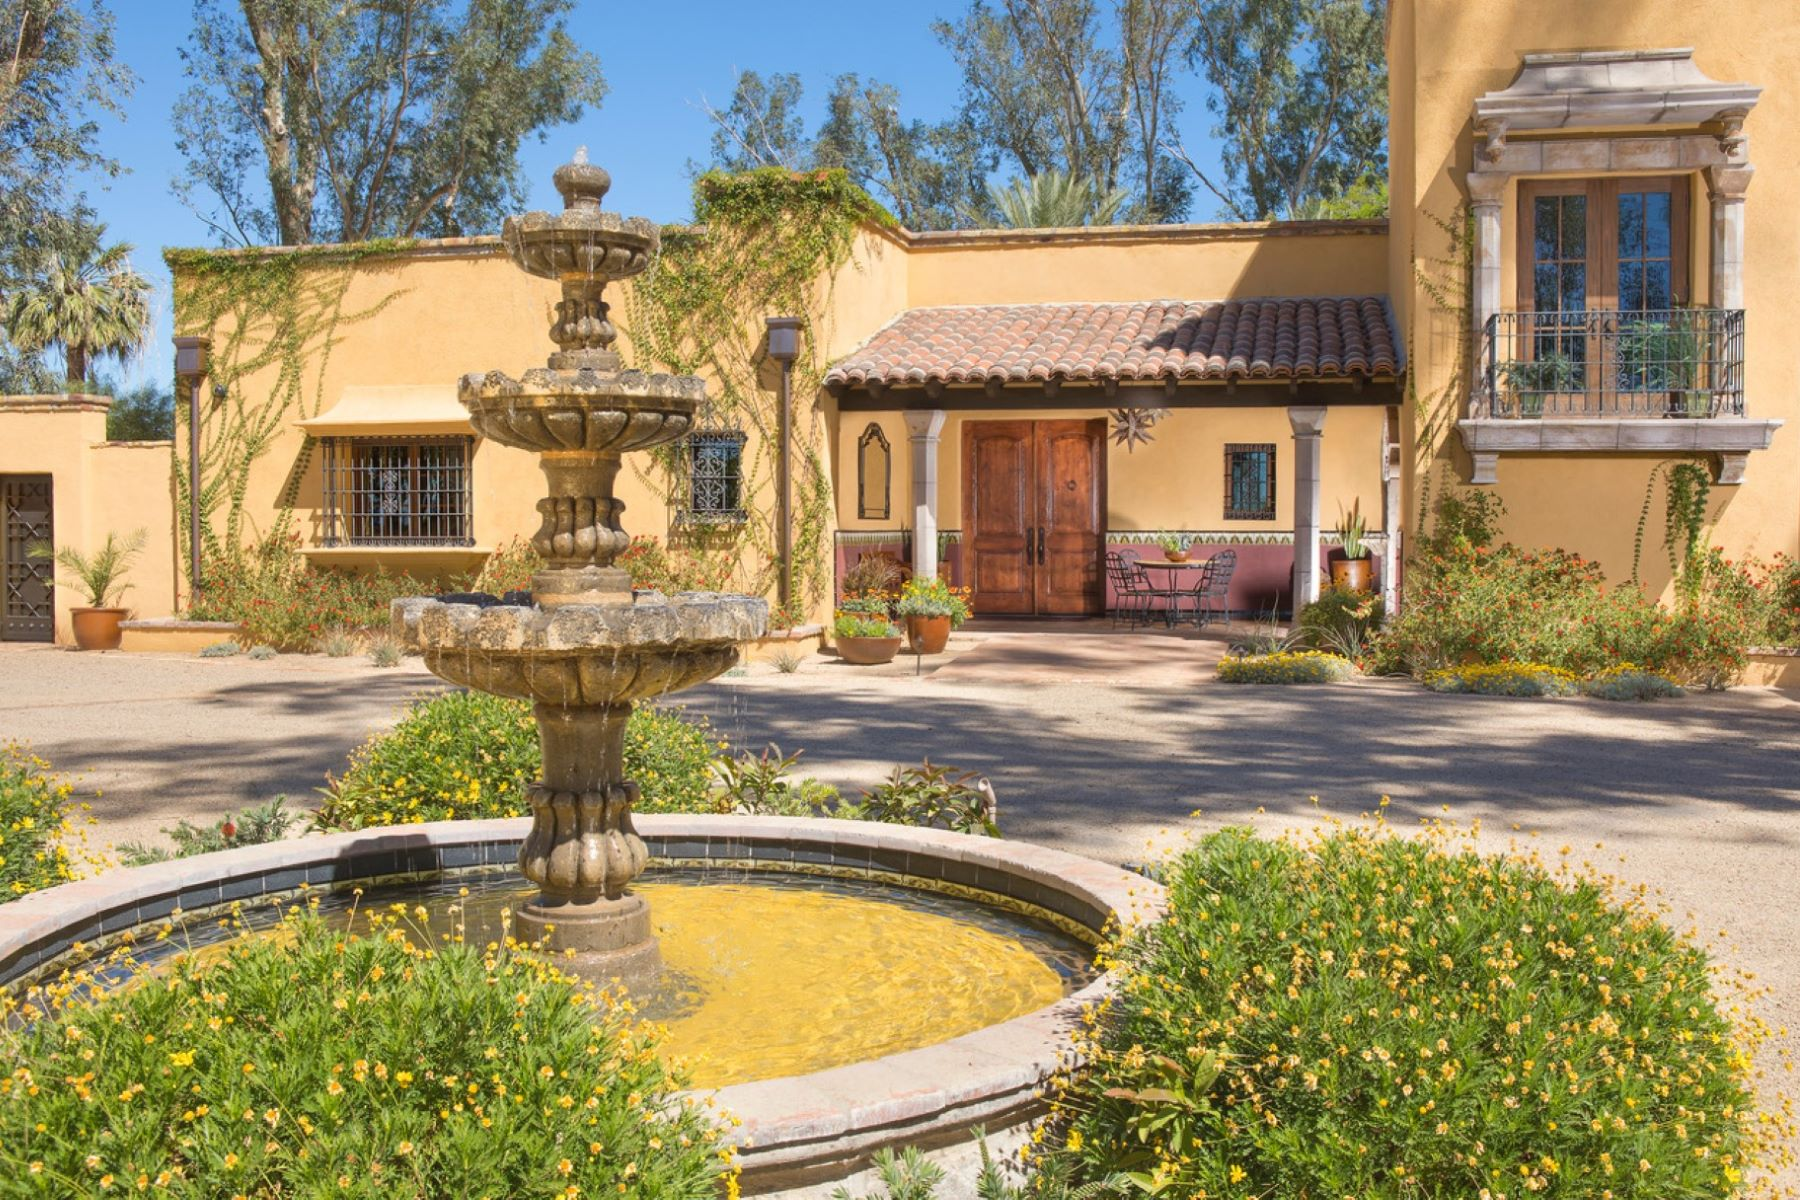 Single Family Homes for Active at Unique, Private Estate on 4.6 Acres 630 W Calle Concordia Oro Valley, Arizona 85704 United States